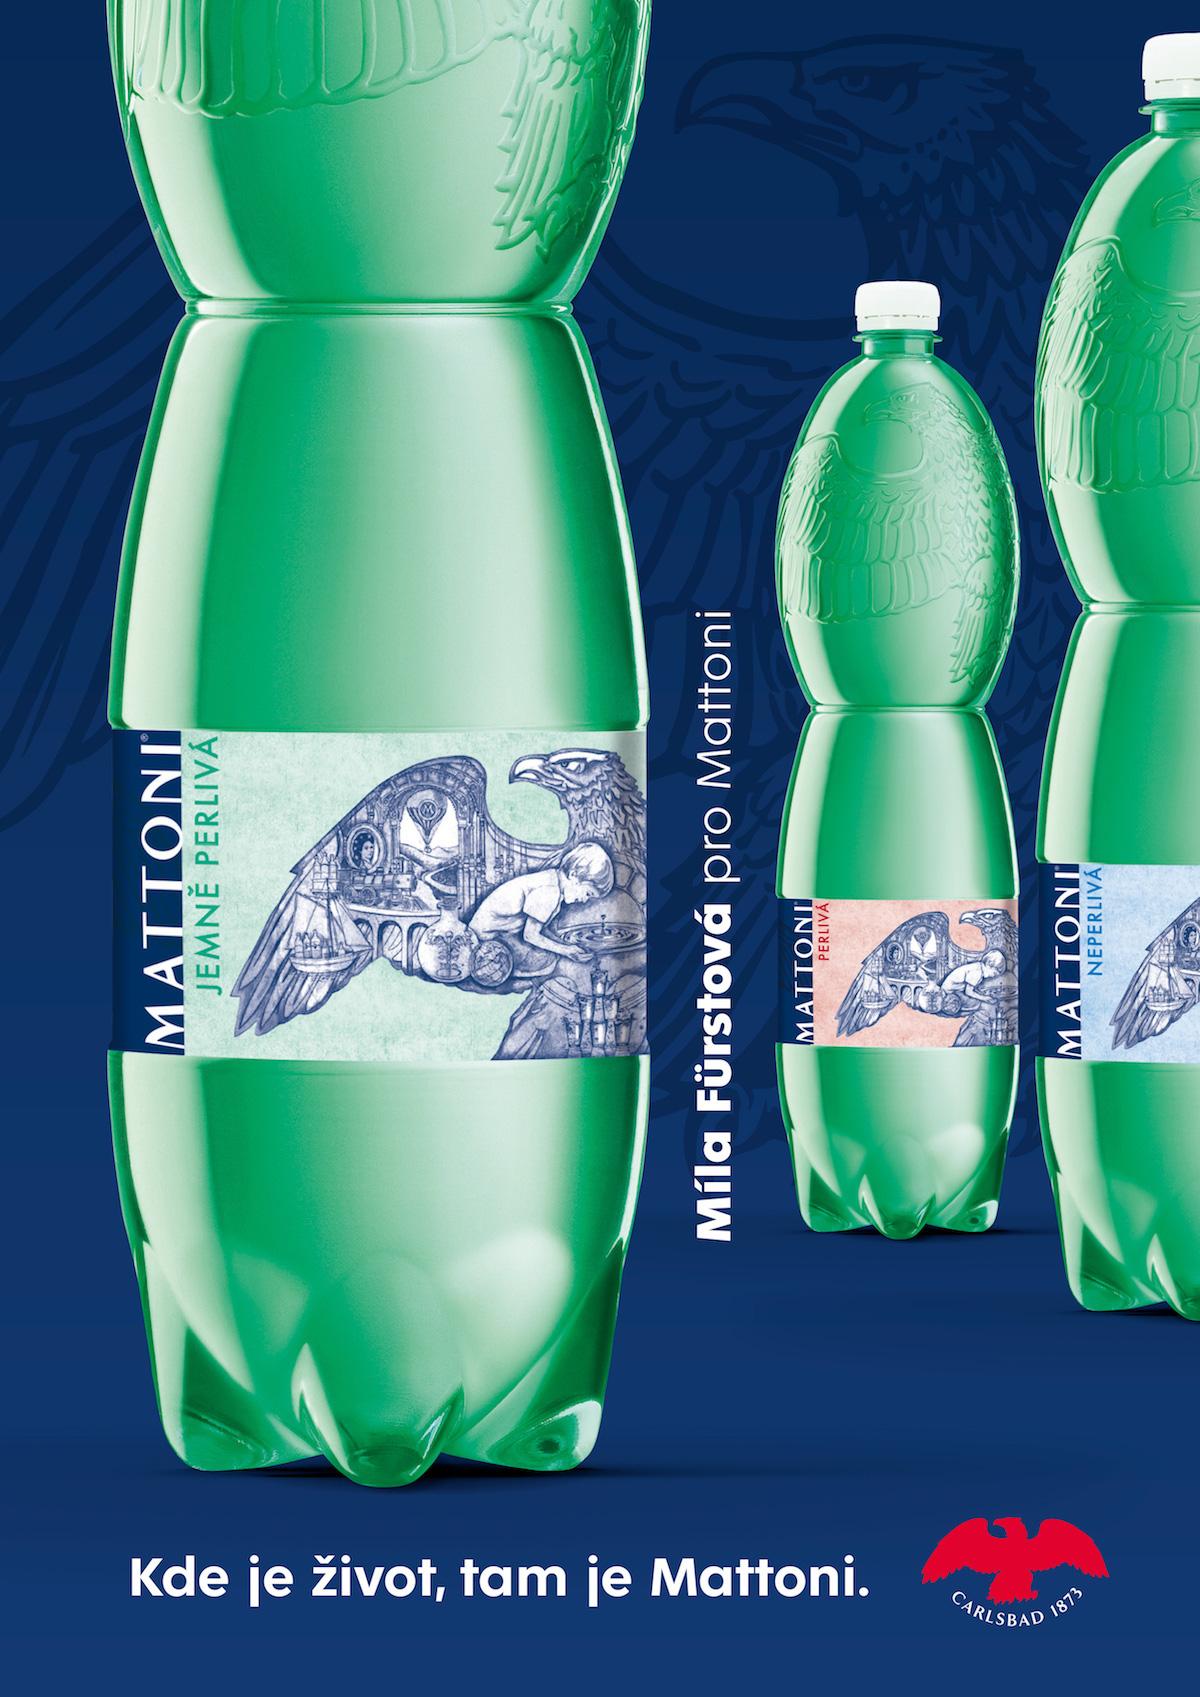 Podoba limitované edice etiket Mattoni